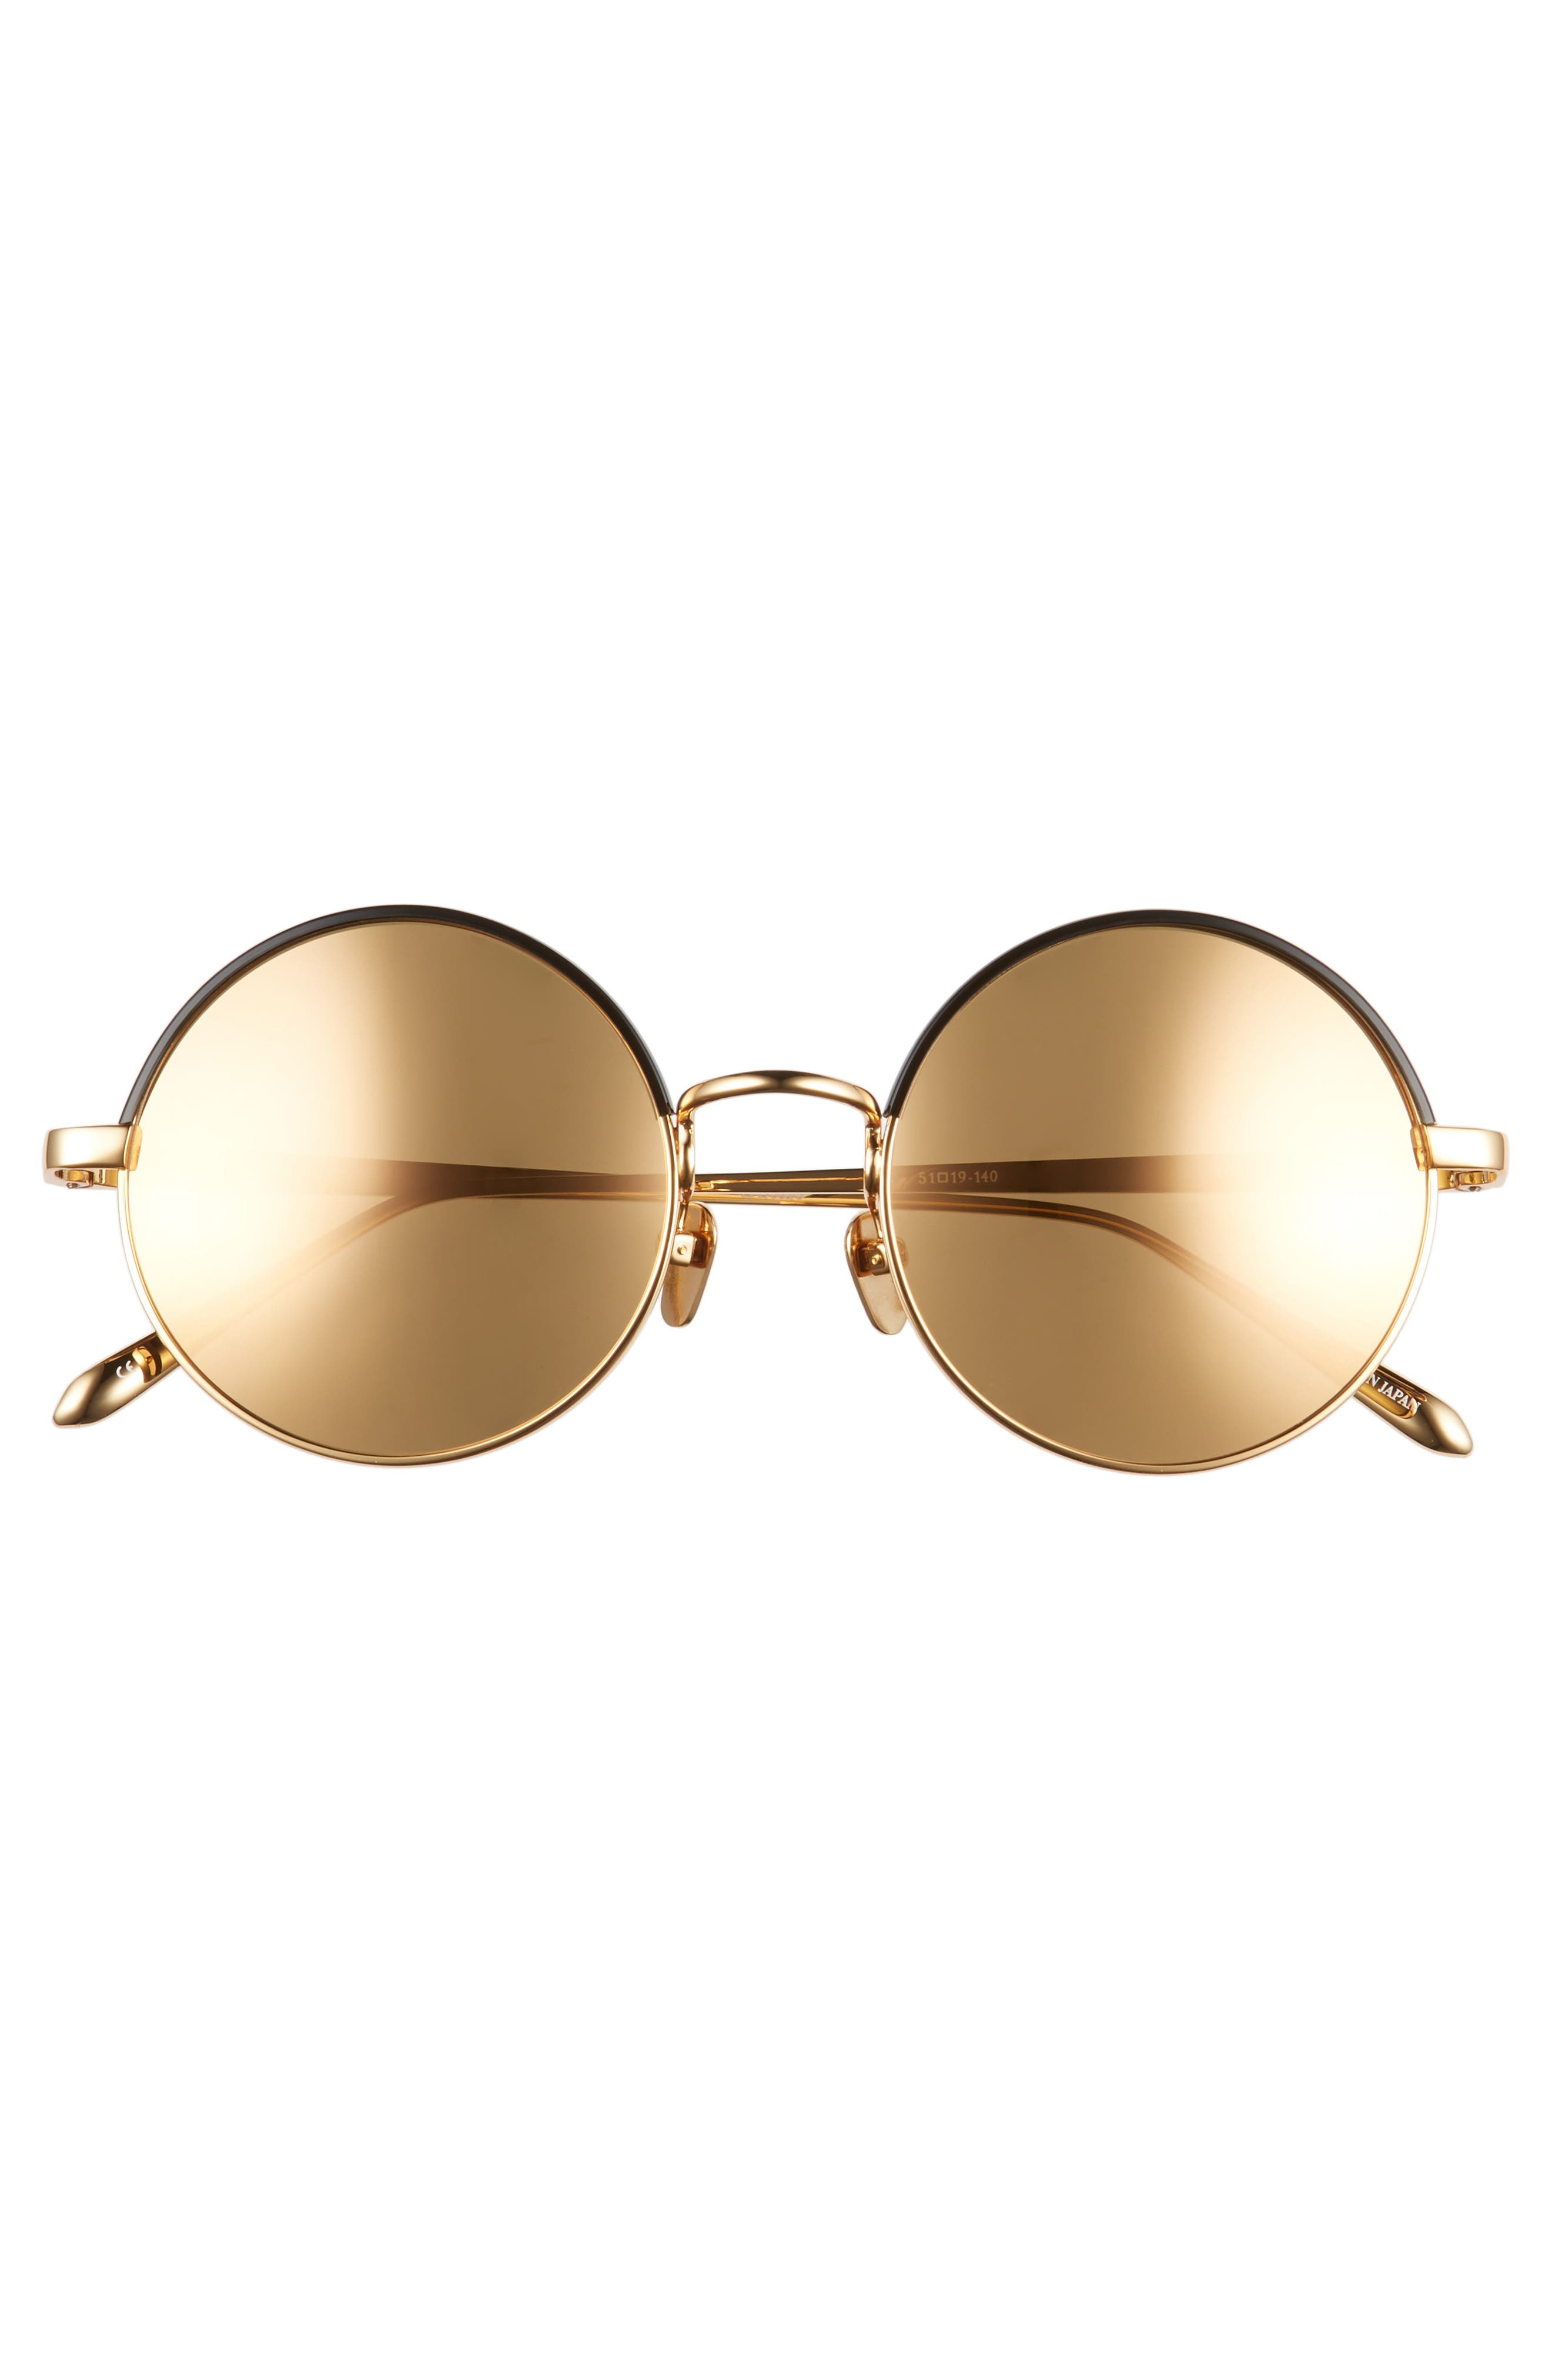 51mm Mirrored 18 Karat Gold Trim Round Sunglasses,                             Alternate thumbnail 3, color,                             710